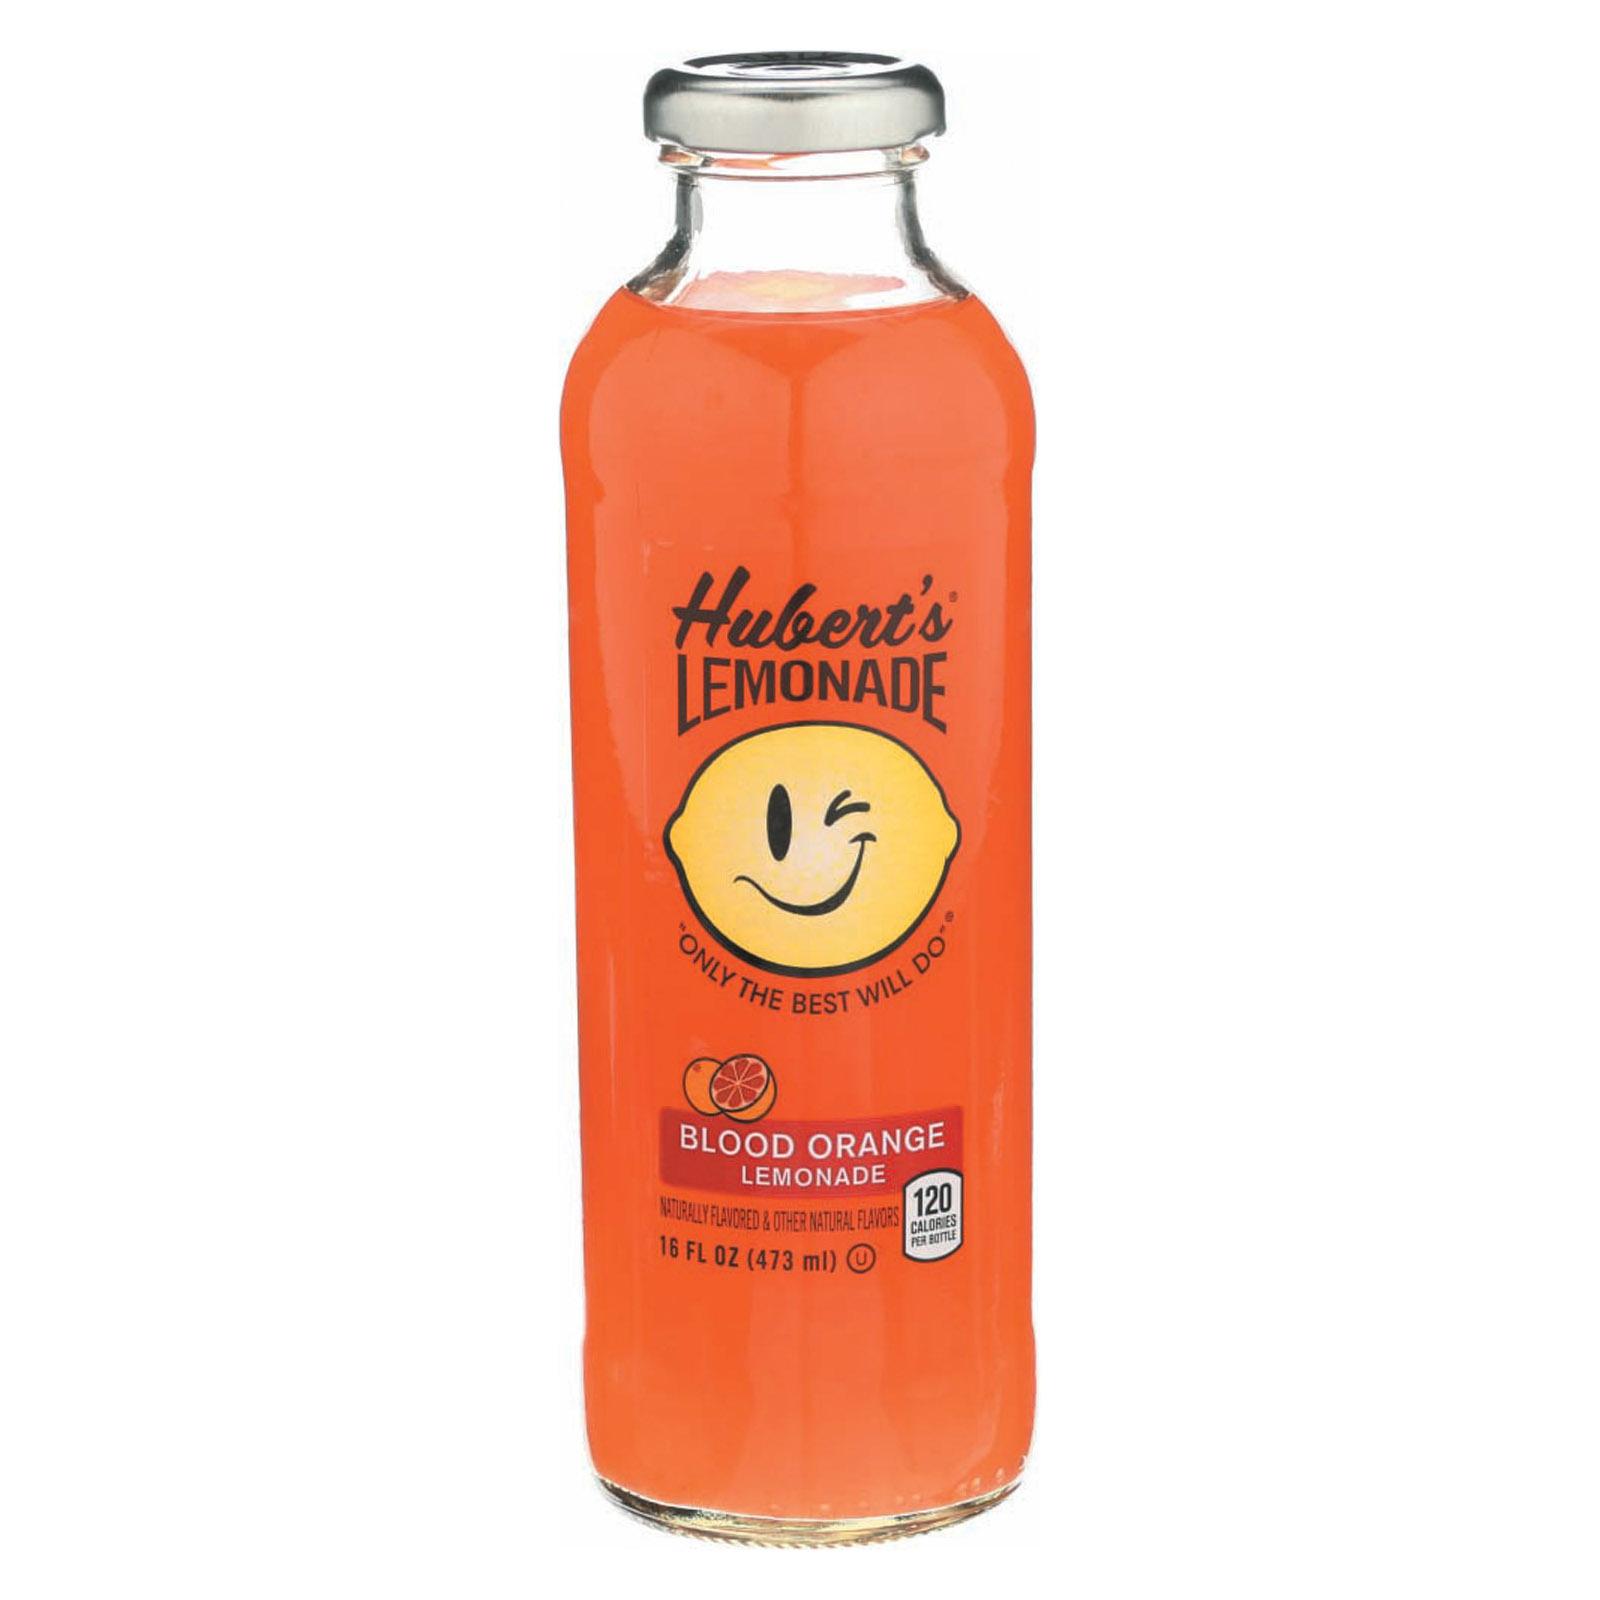 Hubert's Lemonade, Blood Orange, 16 fl oz